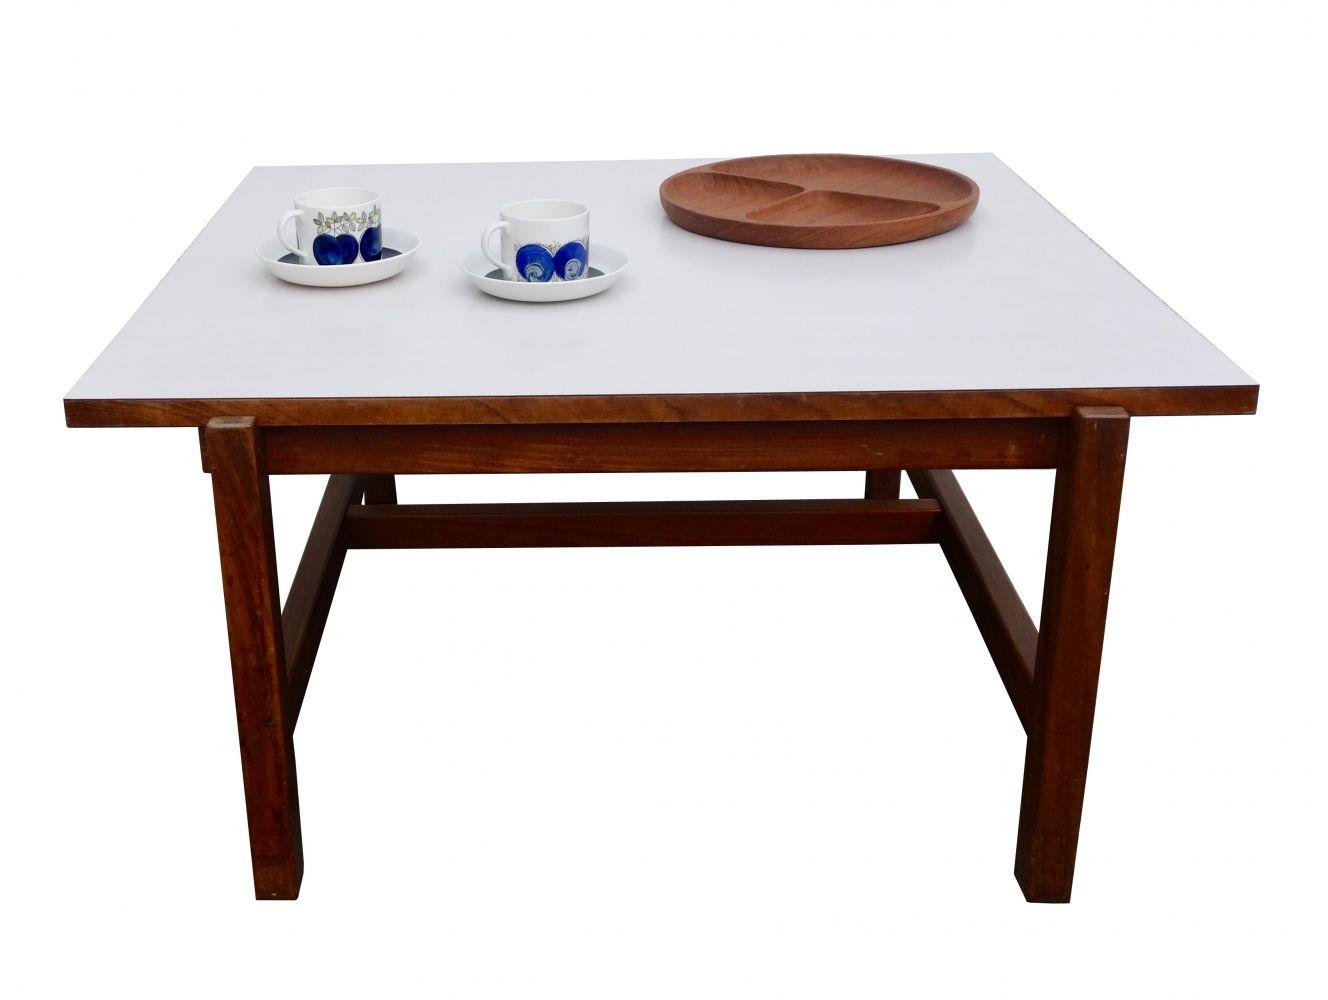 teak coffee table. Pastoe TH08 Teak Coffee Table With Reversible White/teak Top R